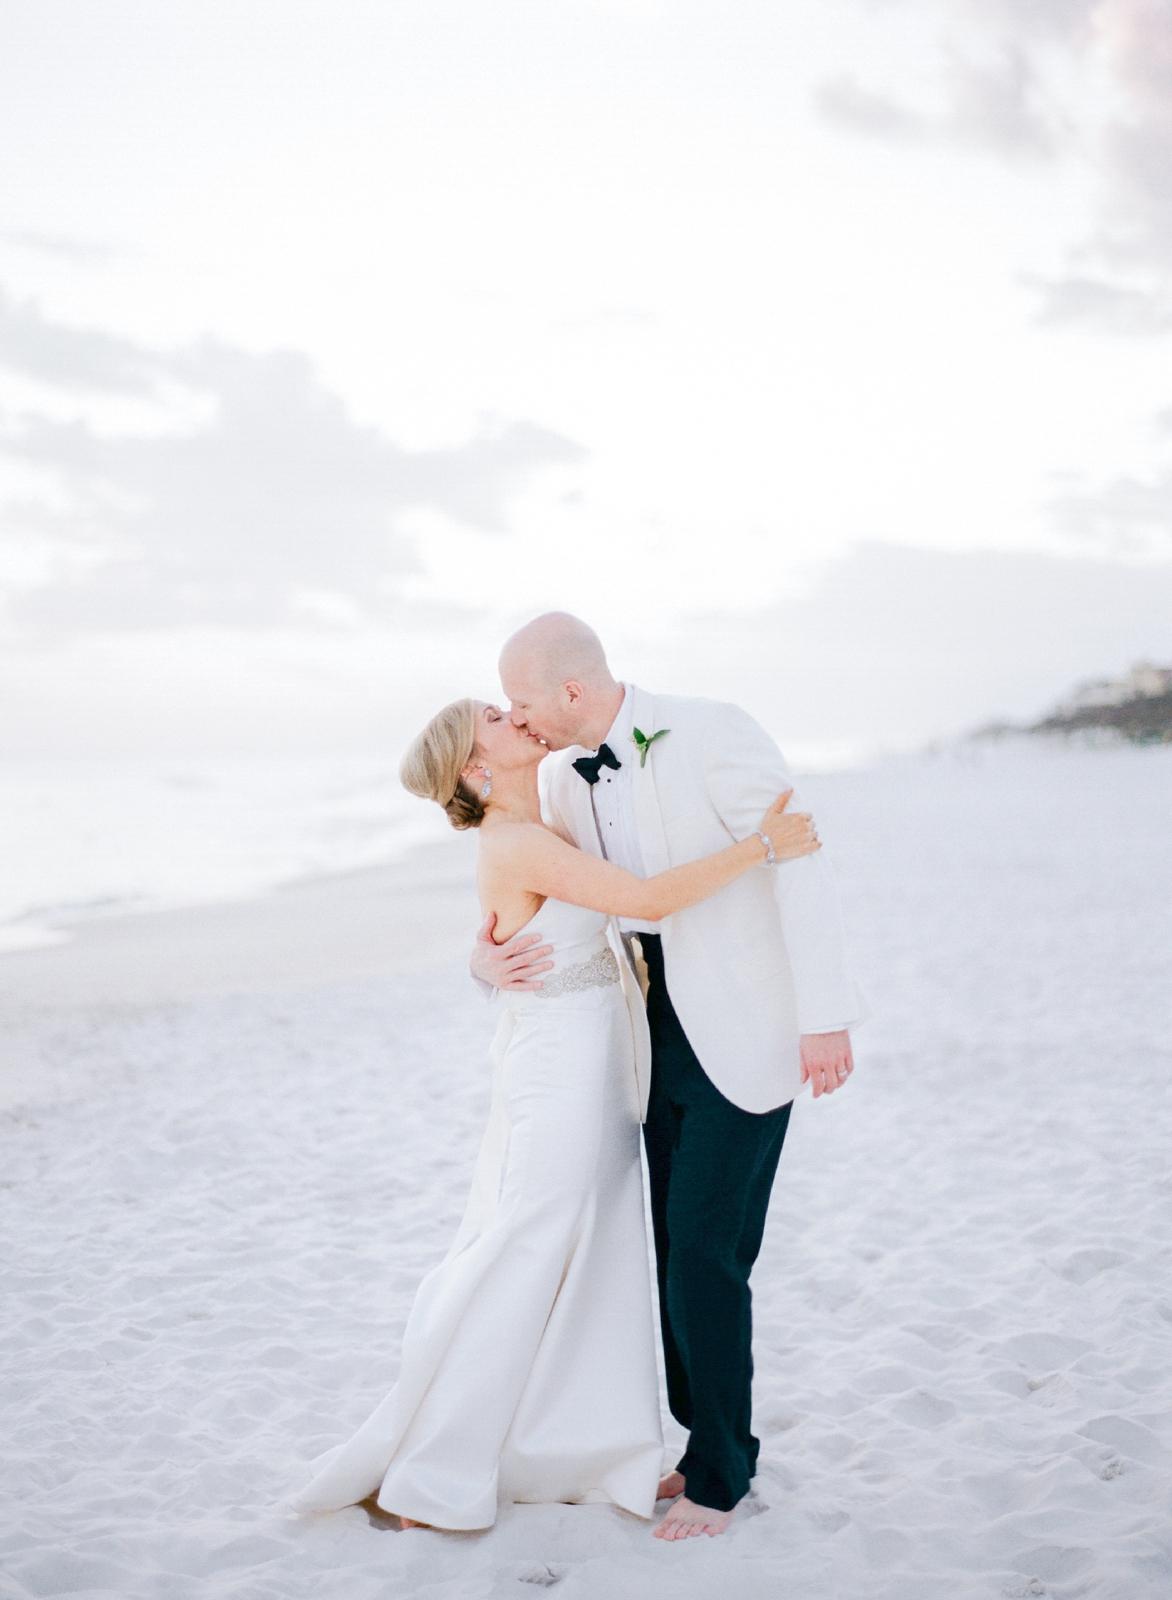 rosemary beach wedding photographer st augustine green rosemary beach shannon griffin_0002.jpg